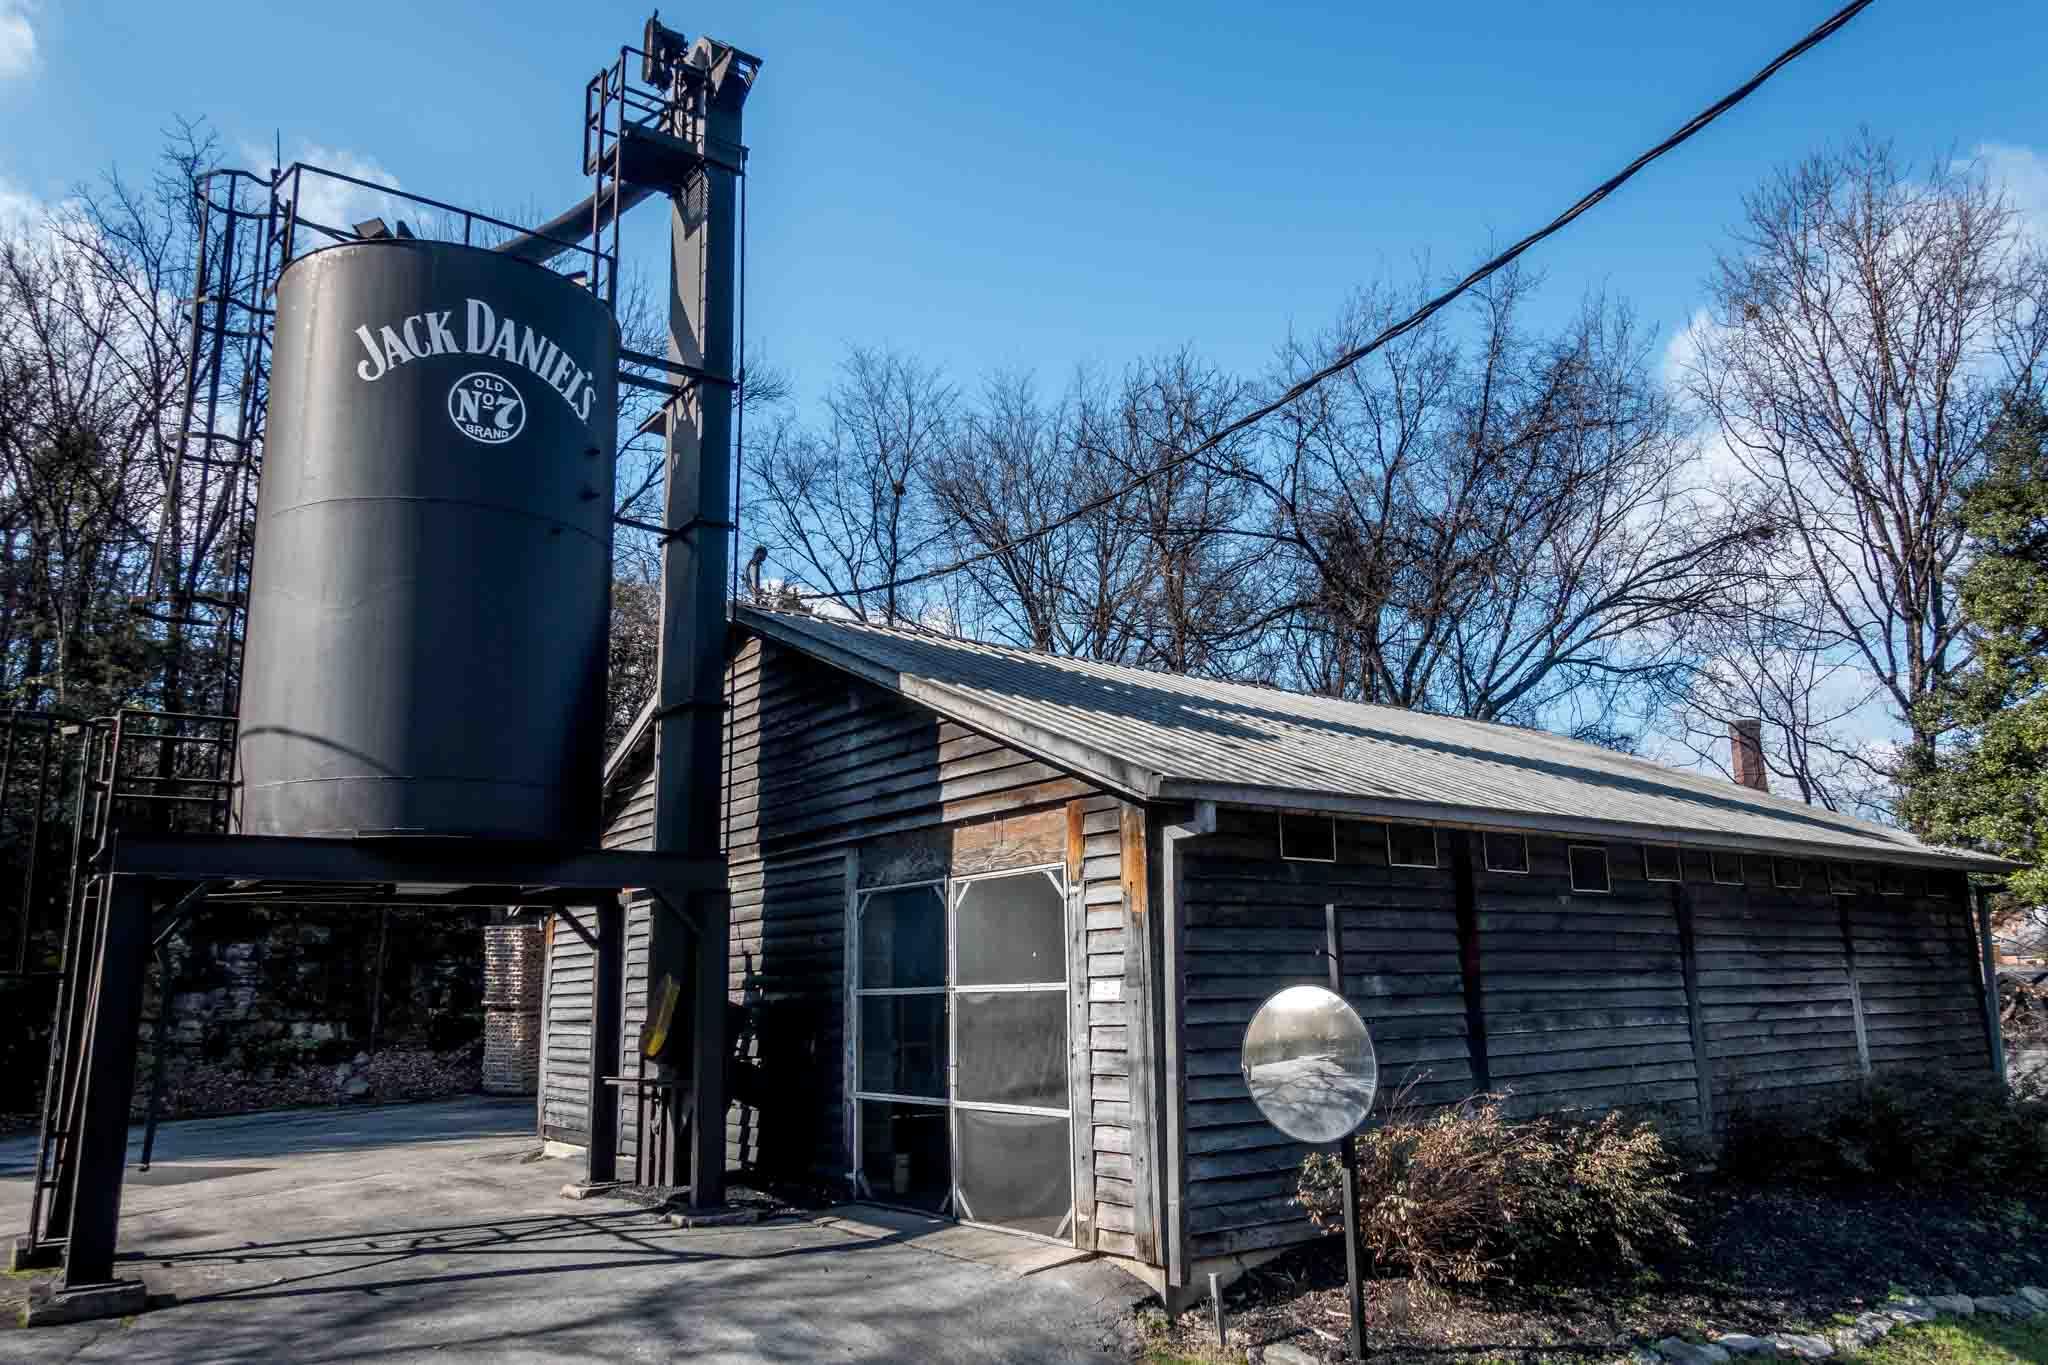 One of the buildings at Jack Daniels distillery